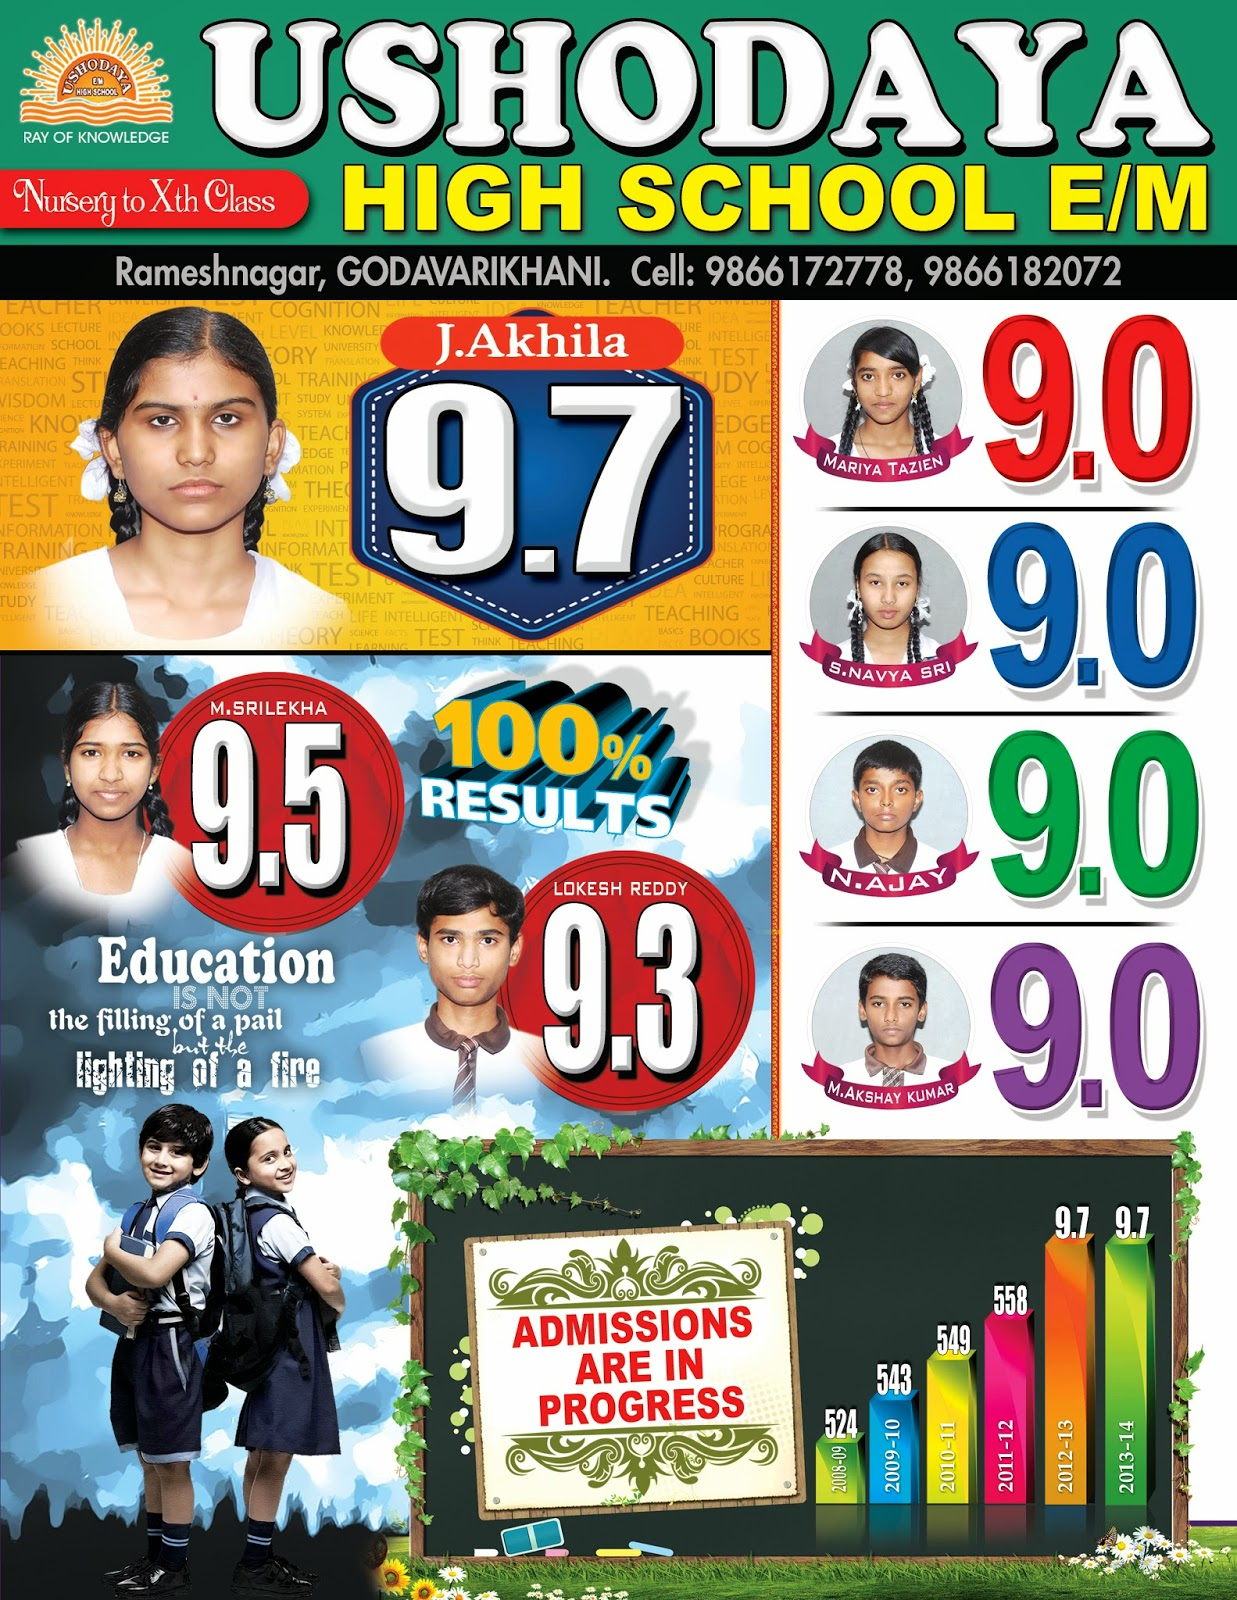 ushodaya brochure design naveengfx brochure desing psd template for schools naveengfx com